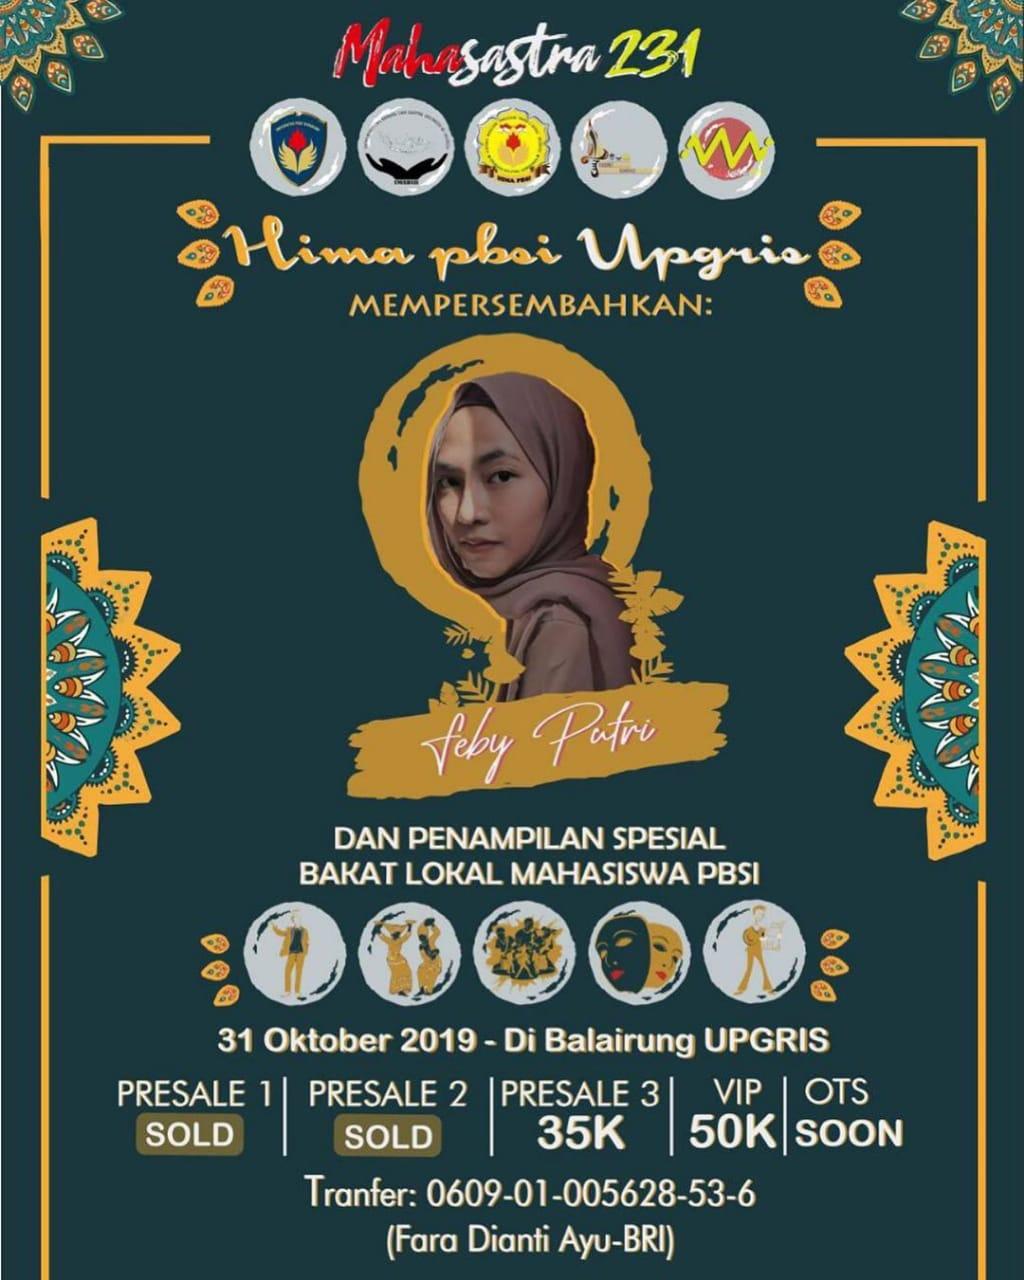 Mahasastra 231 Hima Pbsi Kabinet Magnum Universitas Pgri Semarang